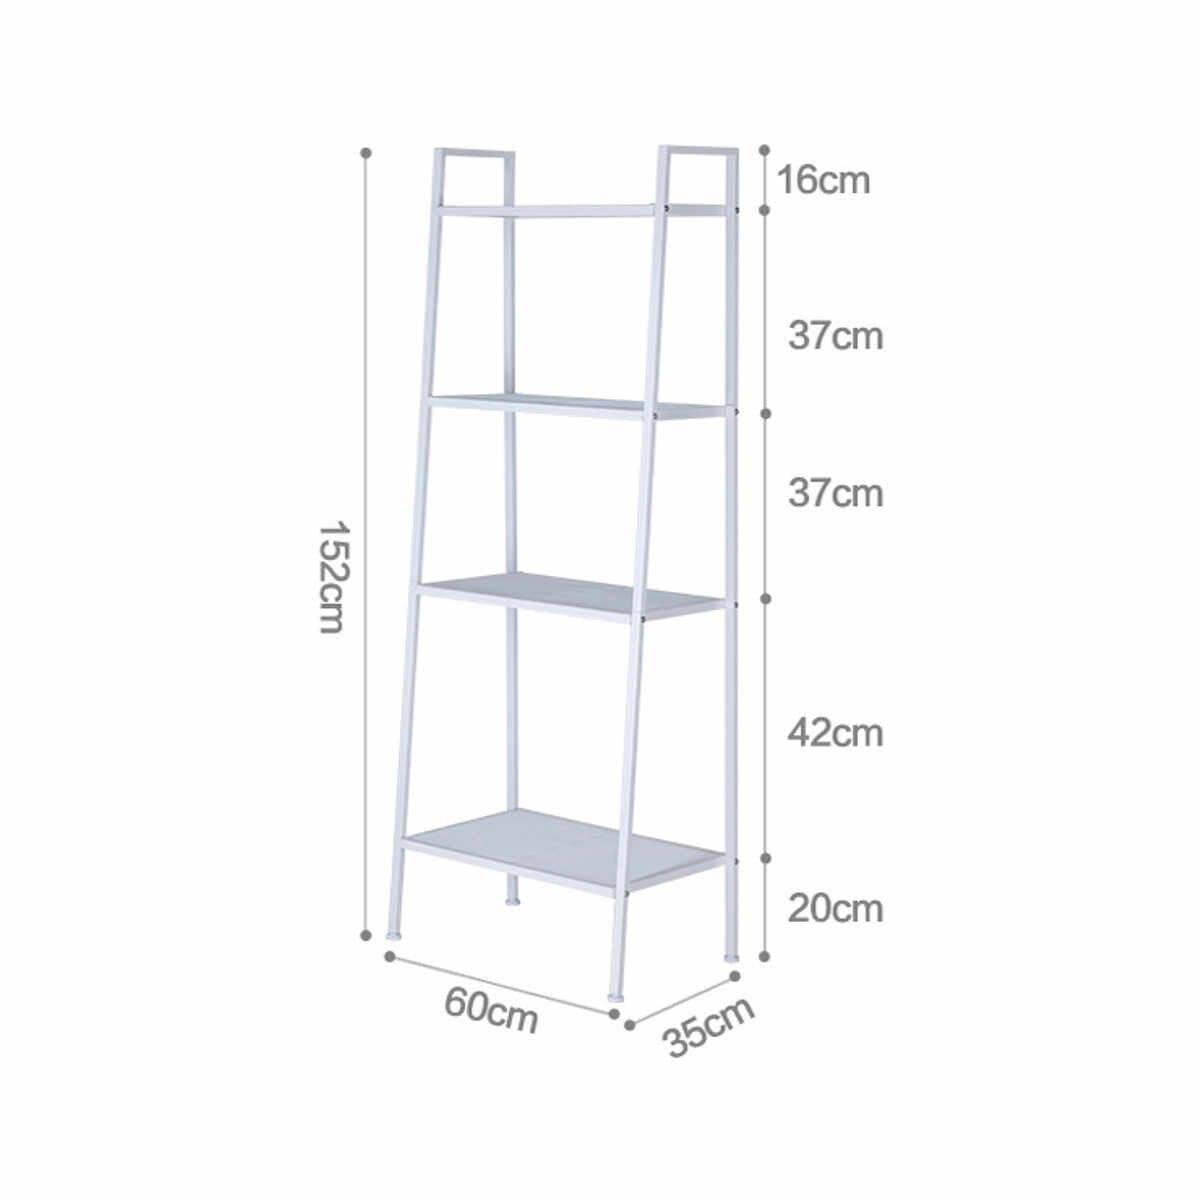 Nordic Floor Stand Shelf Wire Storage Rack Shelf Living Room Sundries Bookshelf Adjustable Oragnizer Home Decoration Storage Holders Racks Aliexpress